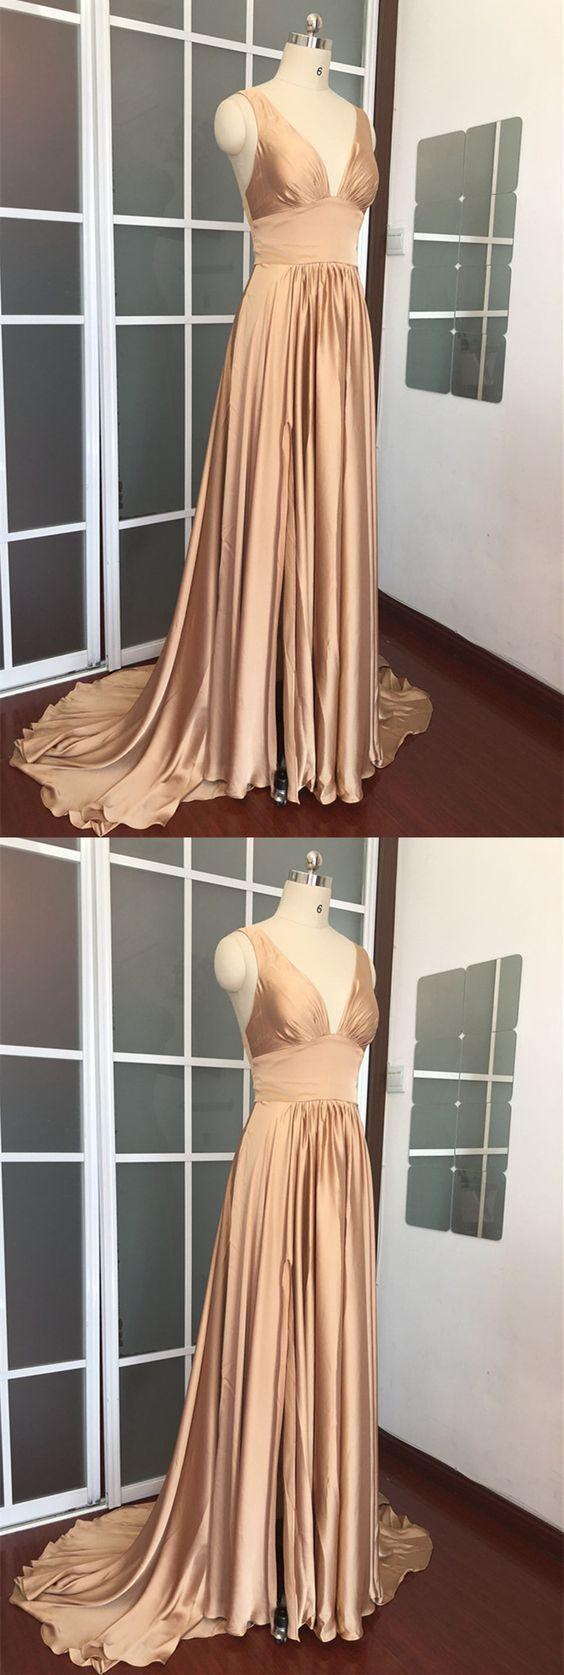 Champagne Bridesmaid Dresses,Chiffon Bridesmaid Dresses,Split Prom Dresses,Long